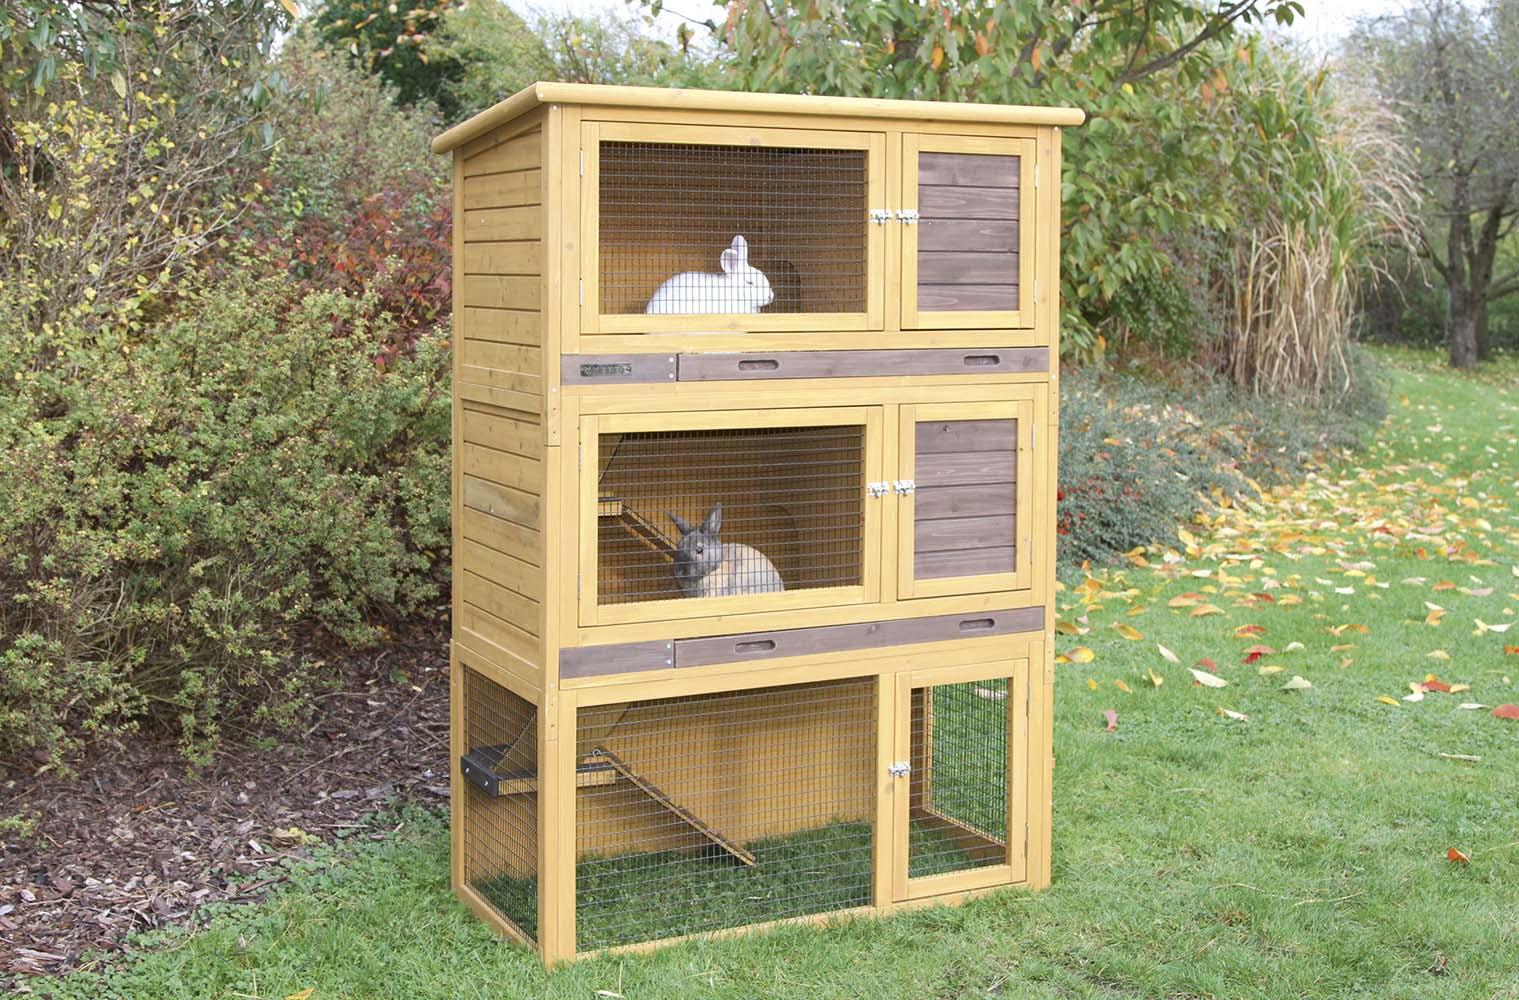 installer un clapier dans le jardin jardindeco blogjardindeco blog. Black Bedroom Furniture Sets. Home Design Ideas